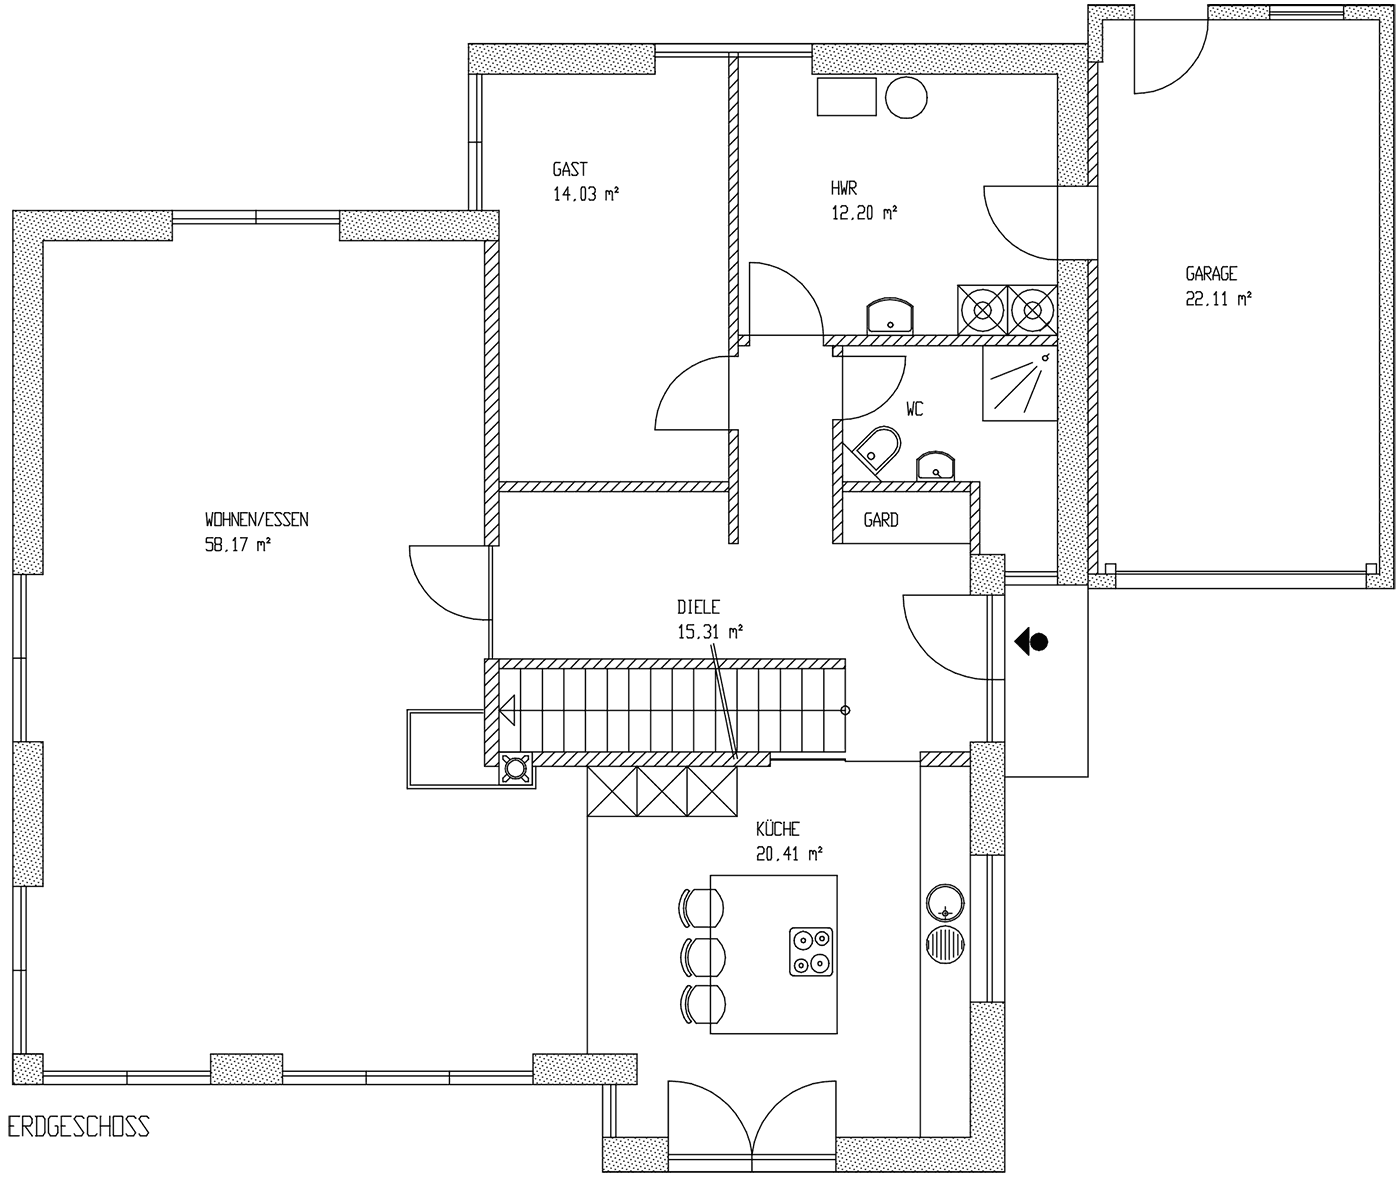 kubisches-bauhaus-erker-grundriss-eg